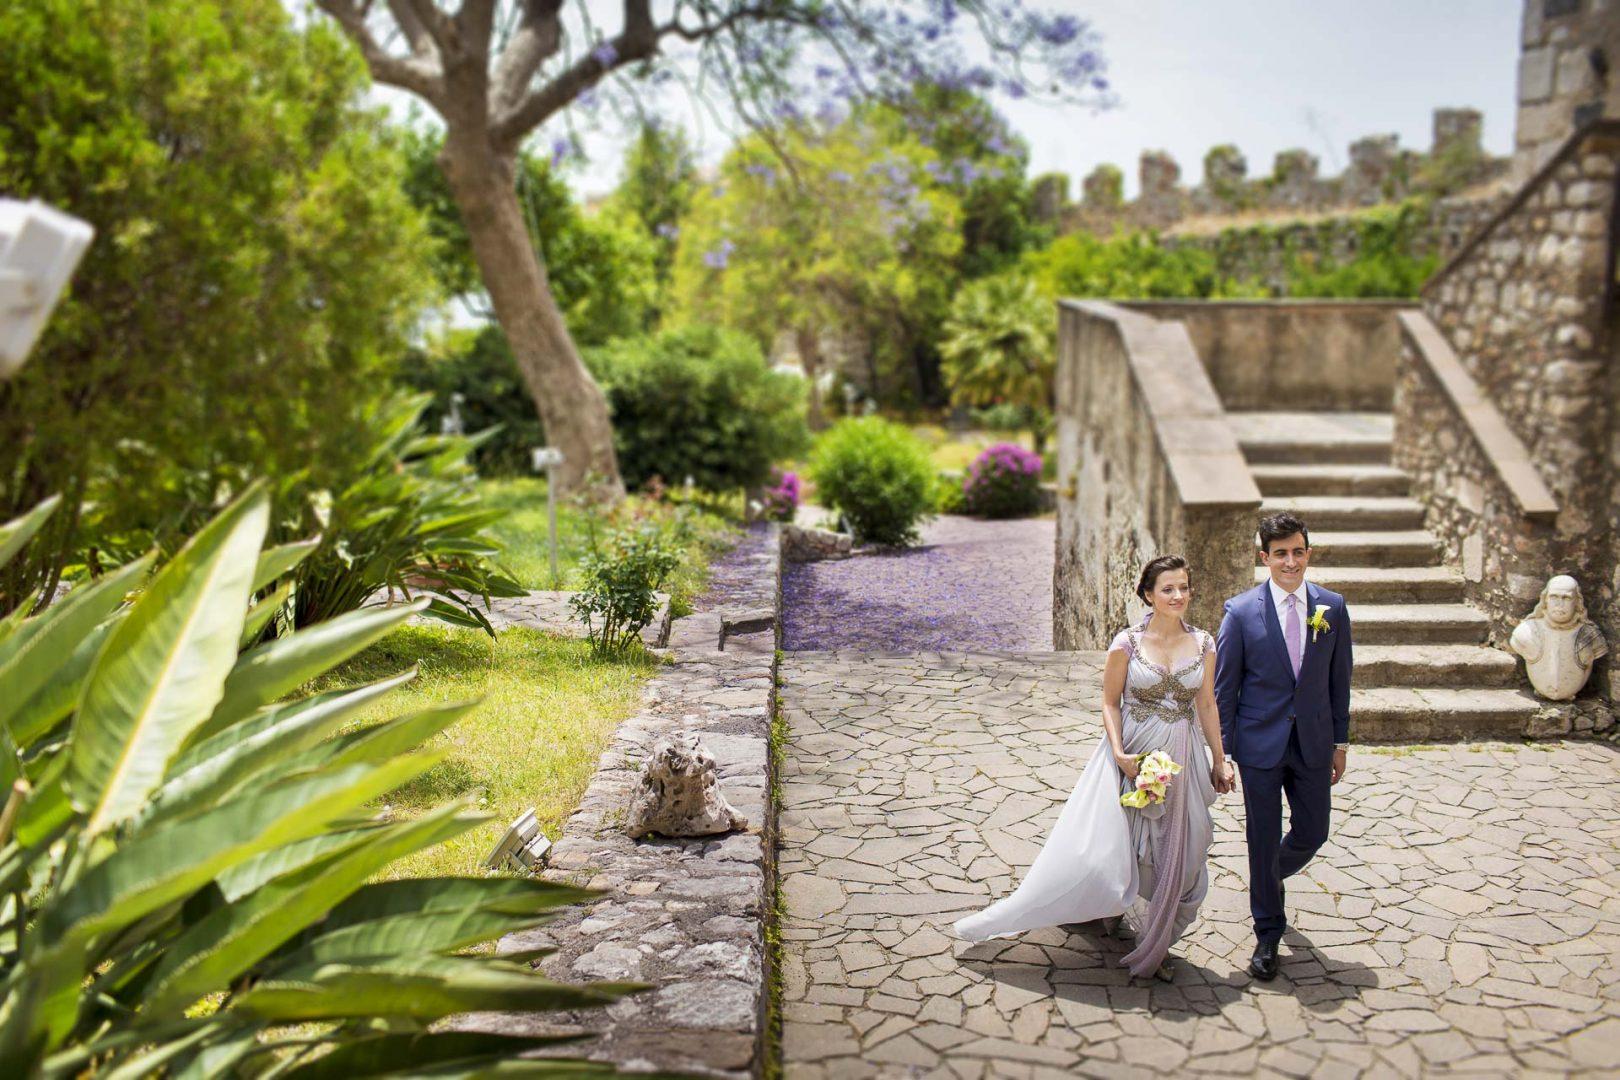 Sposarsi a Taormina - Matrimonio a Taormina - Nino Lombardo 9b387c4704da